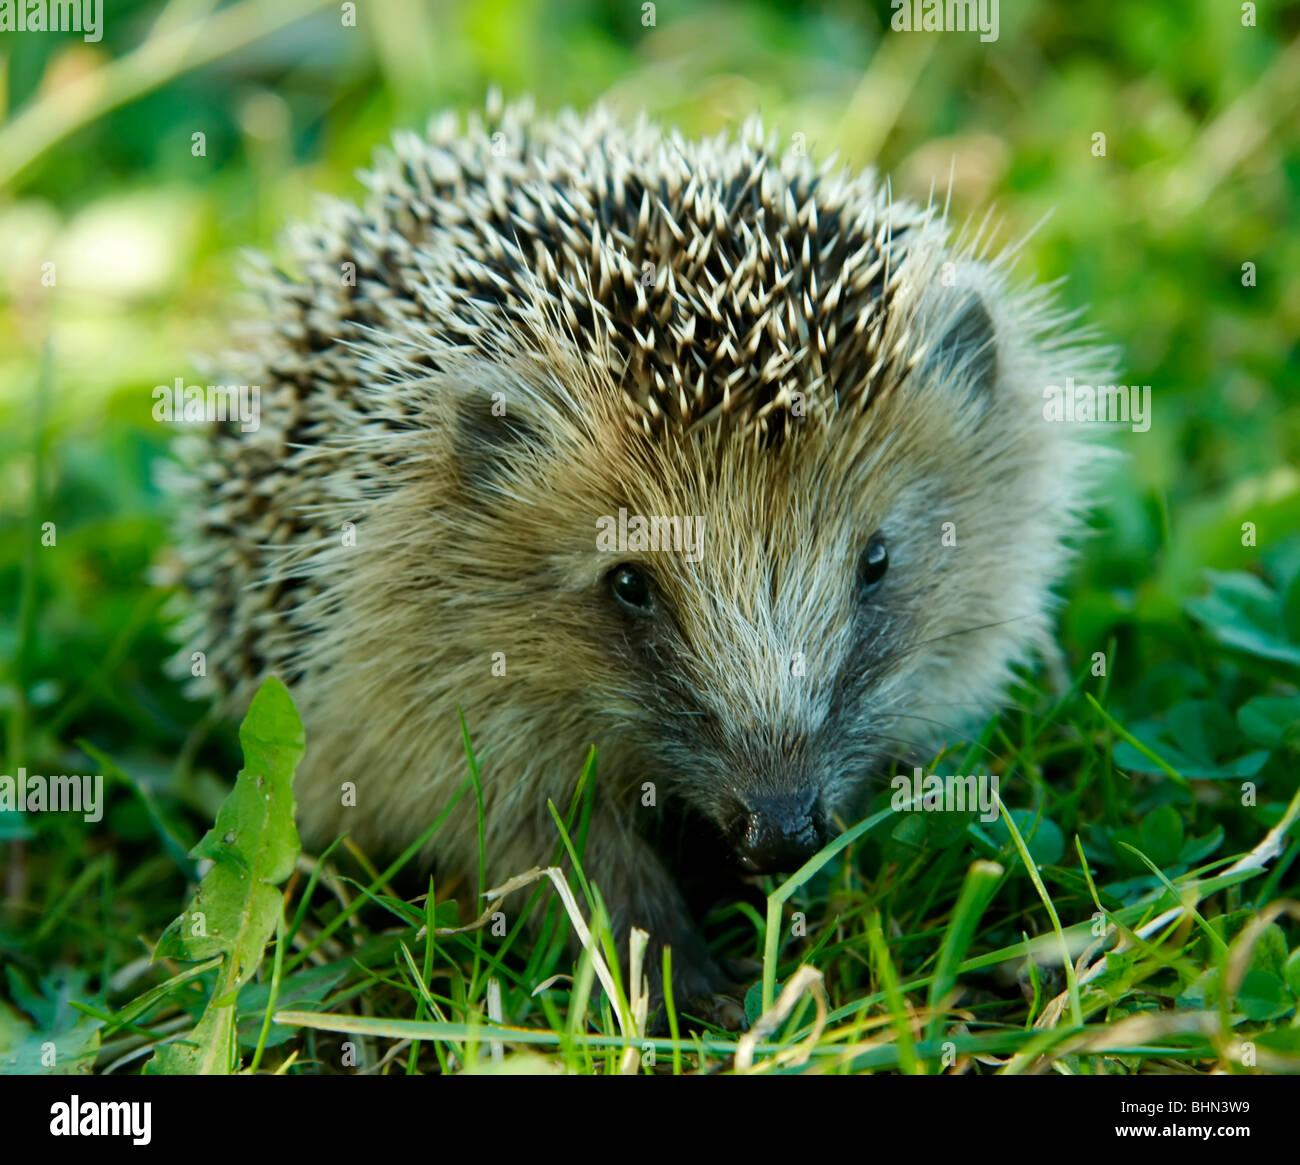 West European Hedgehog (Erinaceus europaeus) - Stock Image